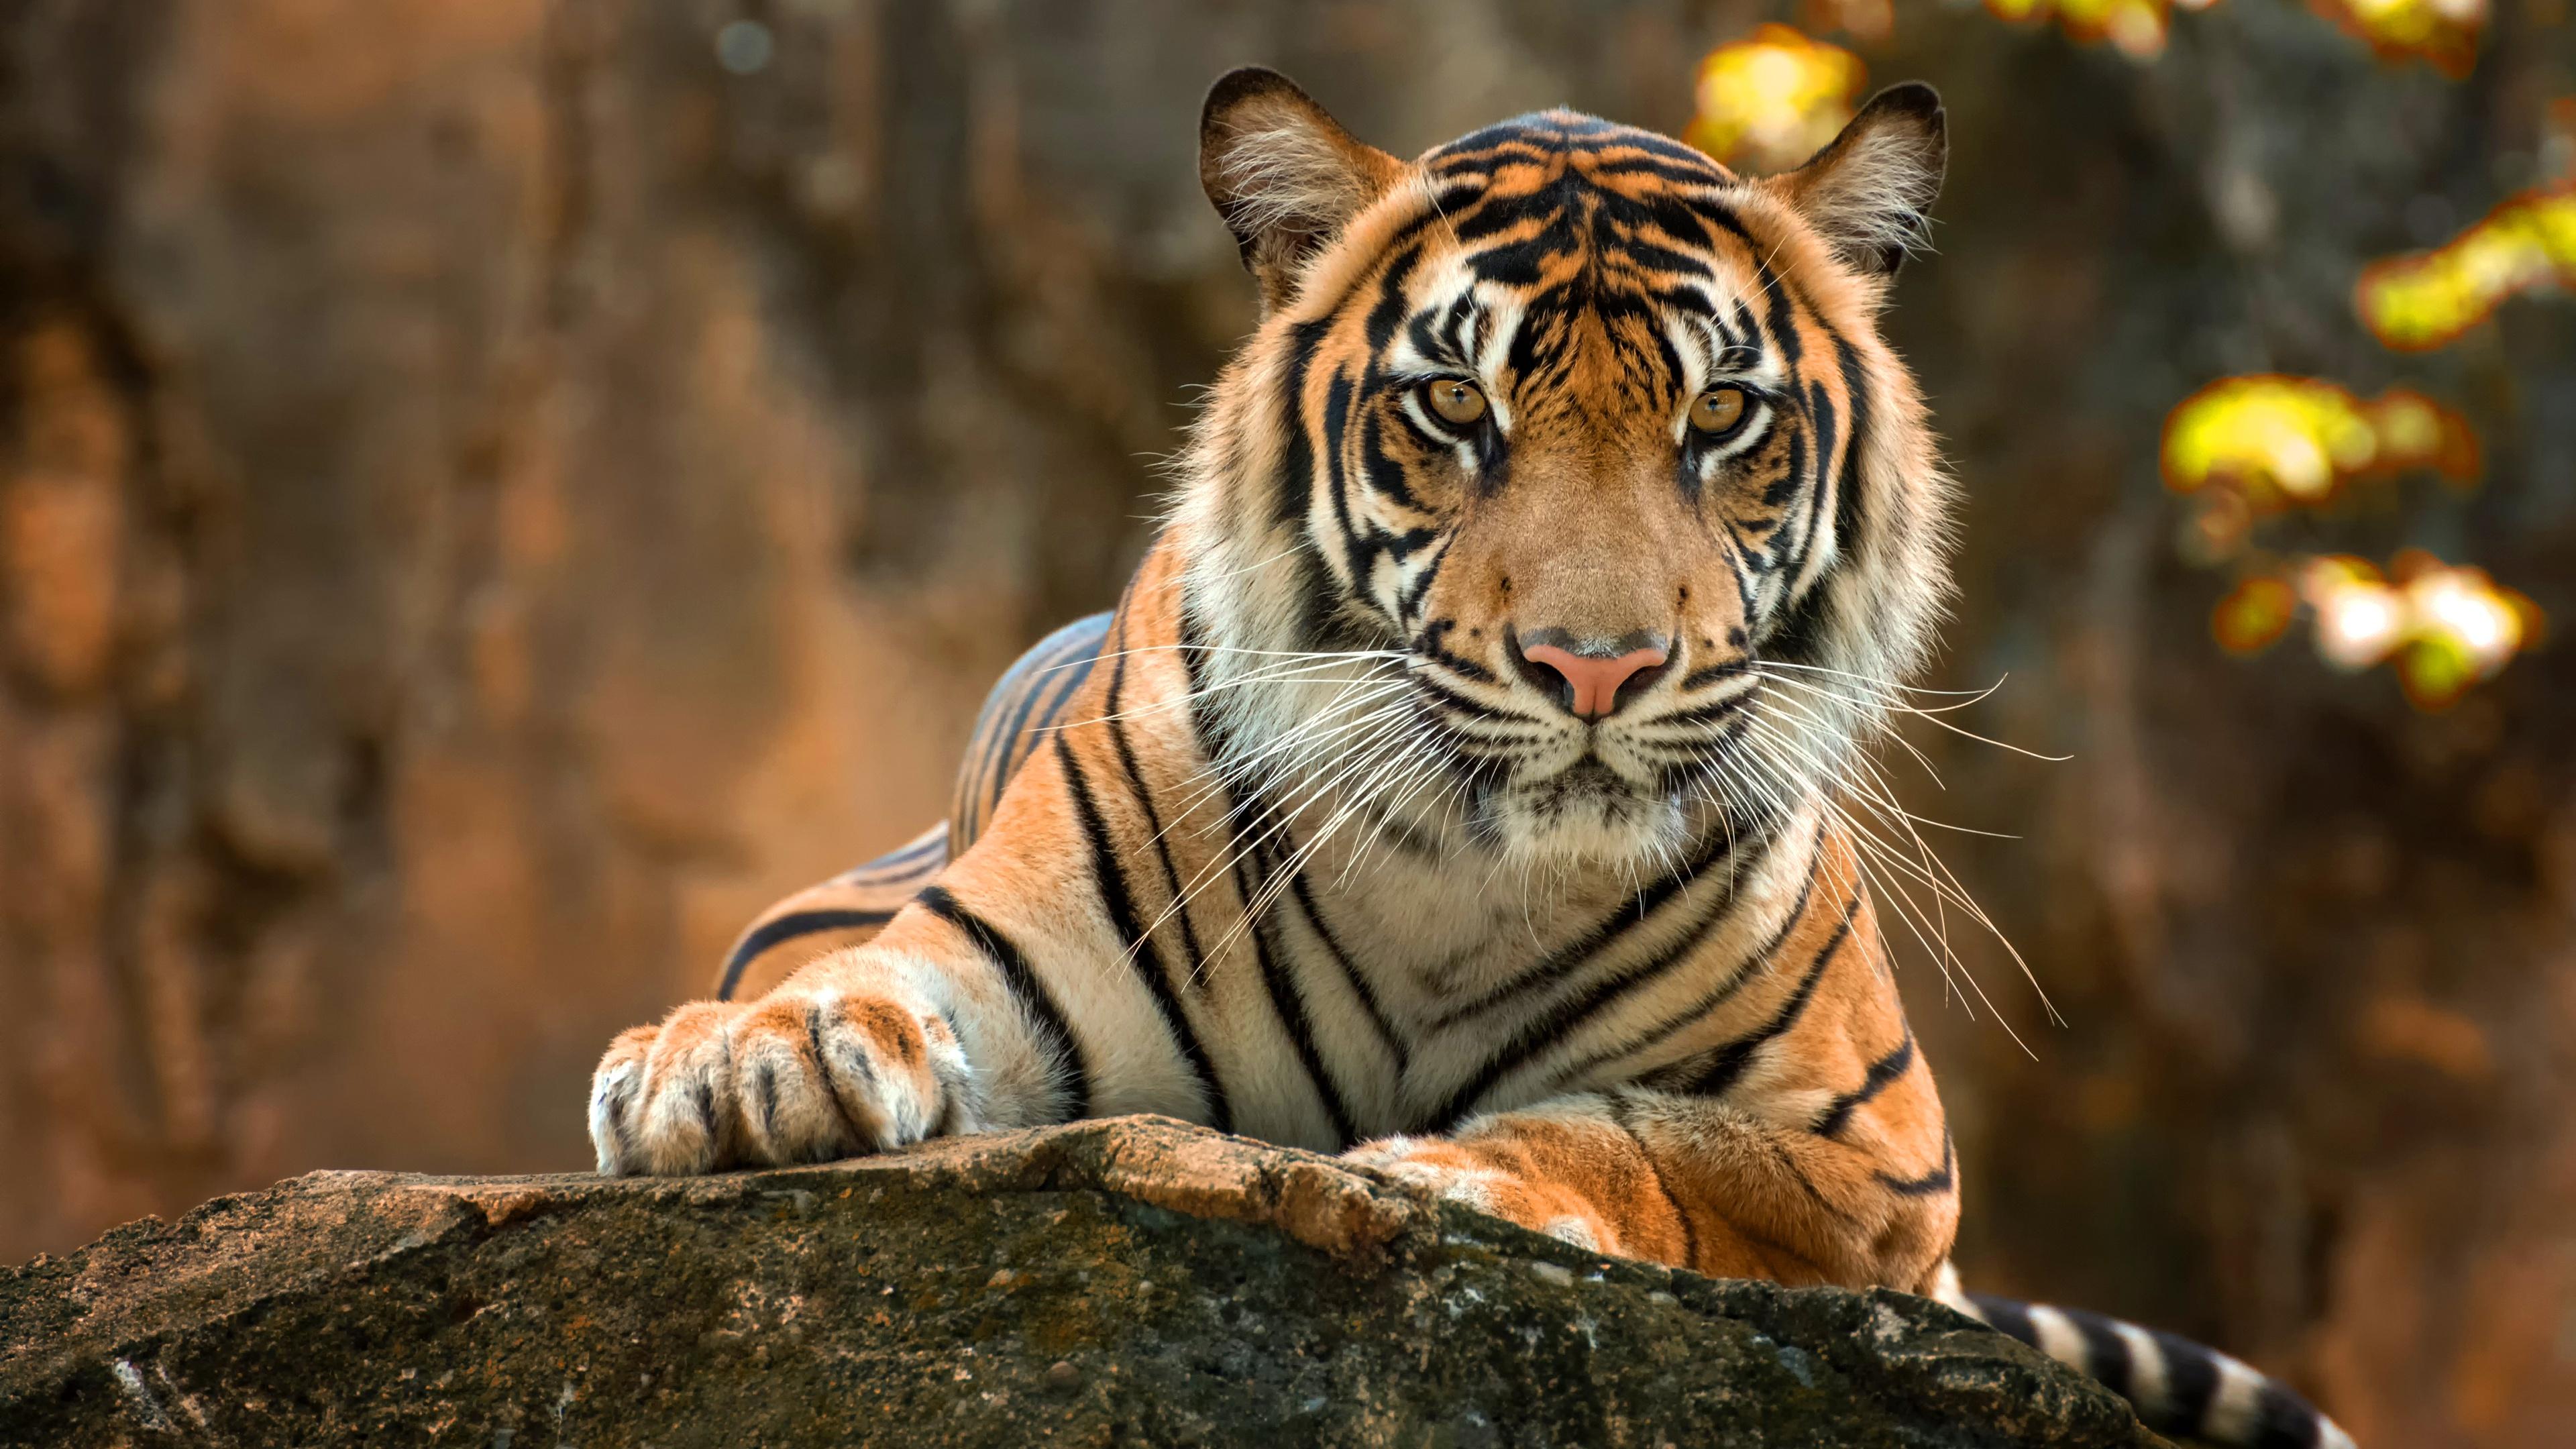 tiger paws 1574938214 - Tiger Paws -